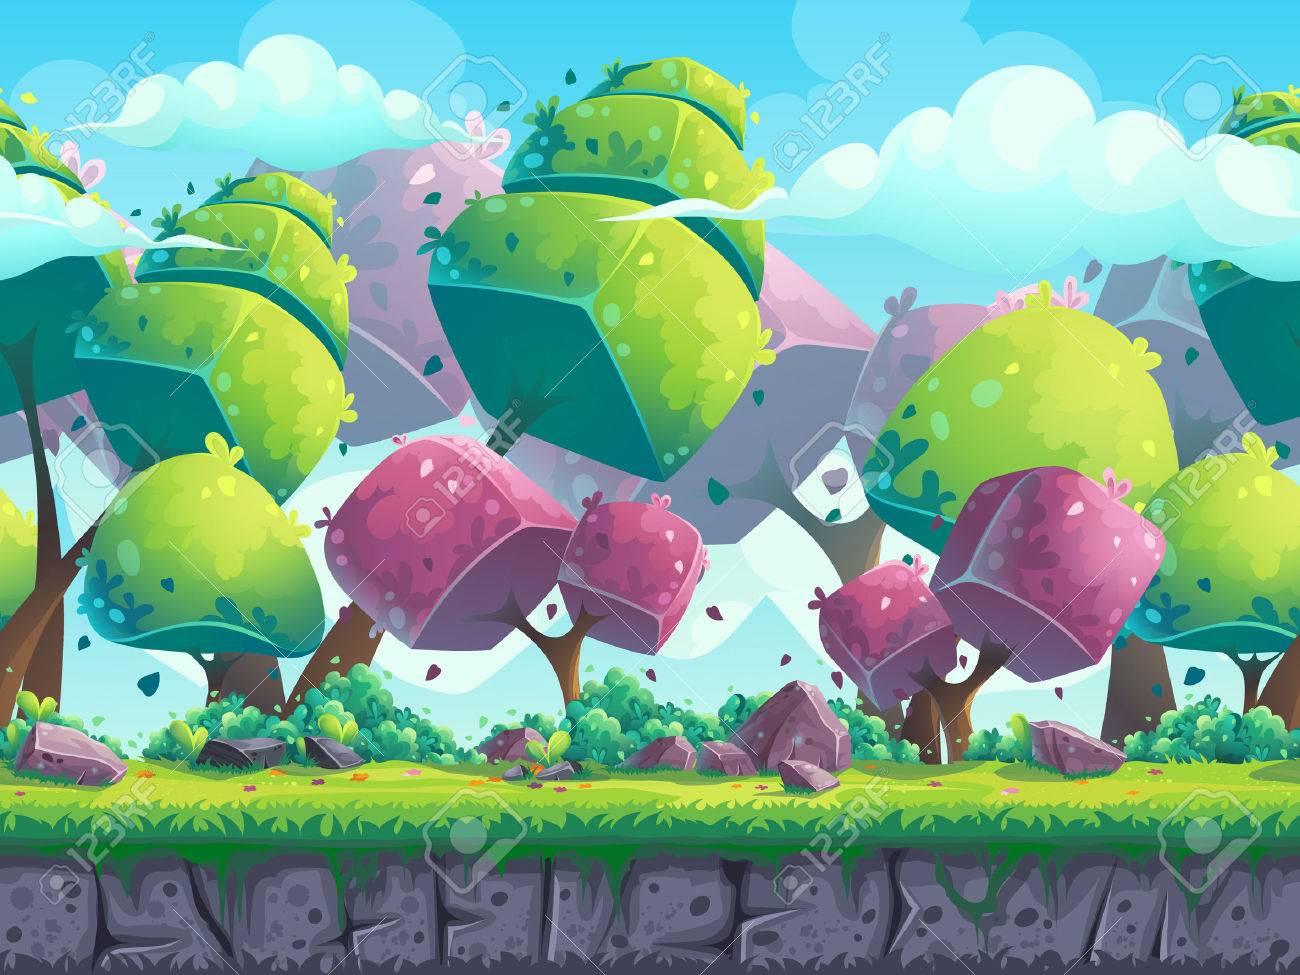 Seamless cartoon natural landscape with futuristic trees - 59195360